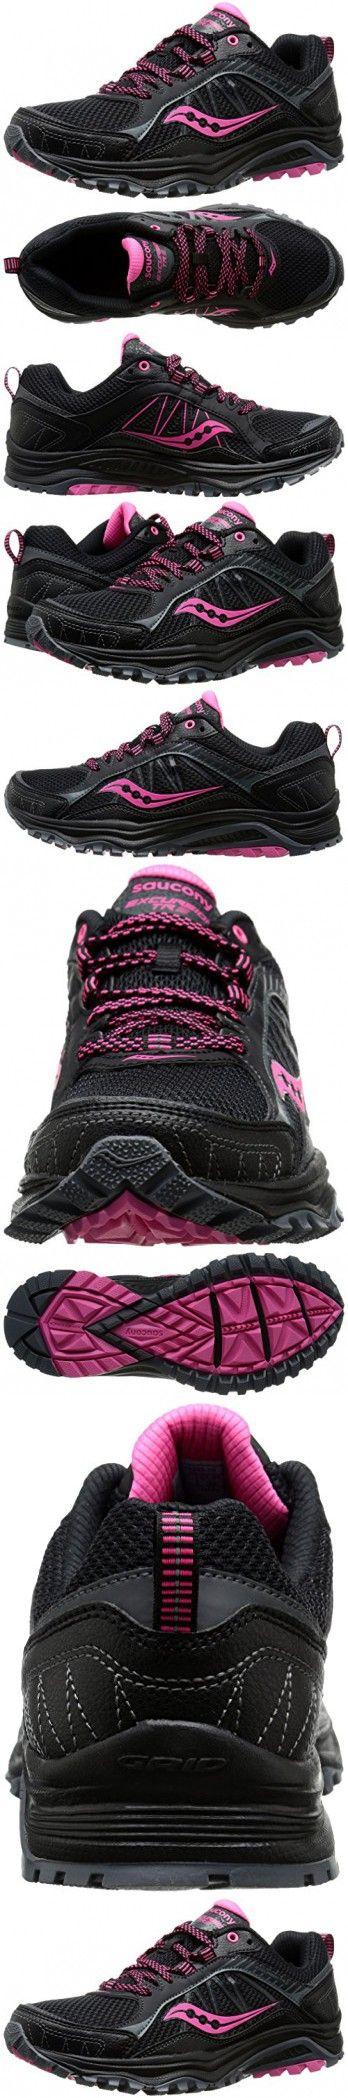 Zapatillas para caminar RYKA Women's Sky, Negro / Rosa, 10 W US